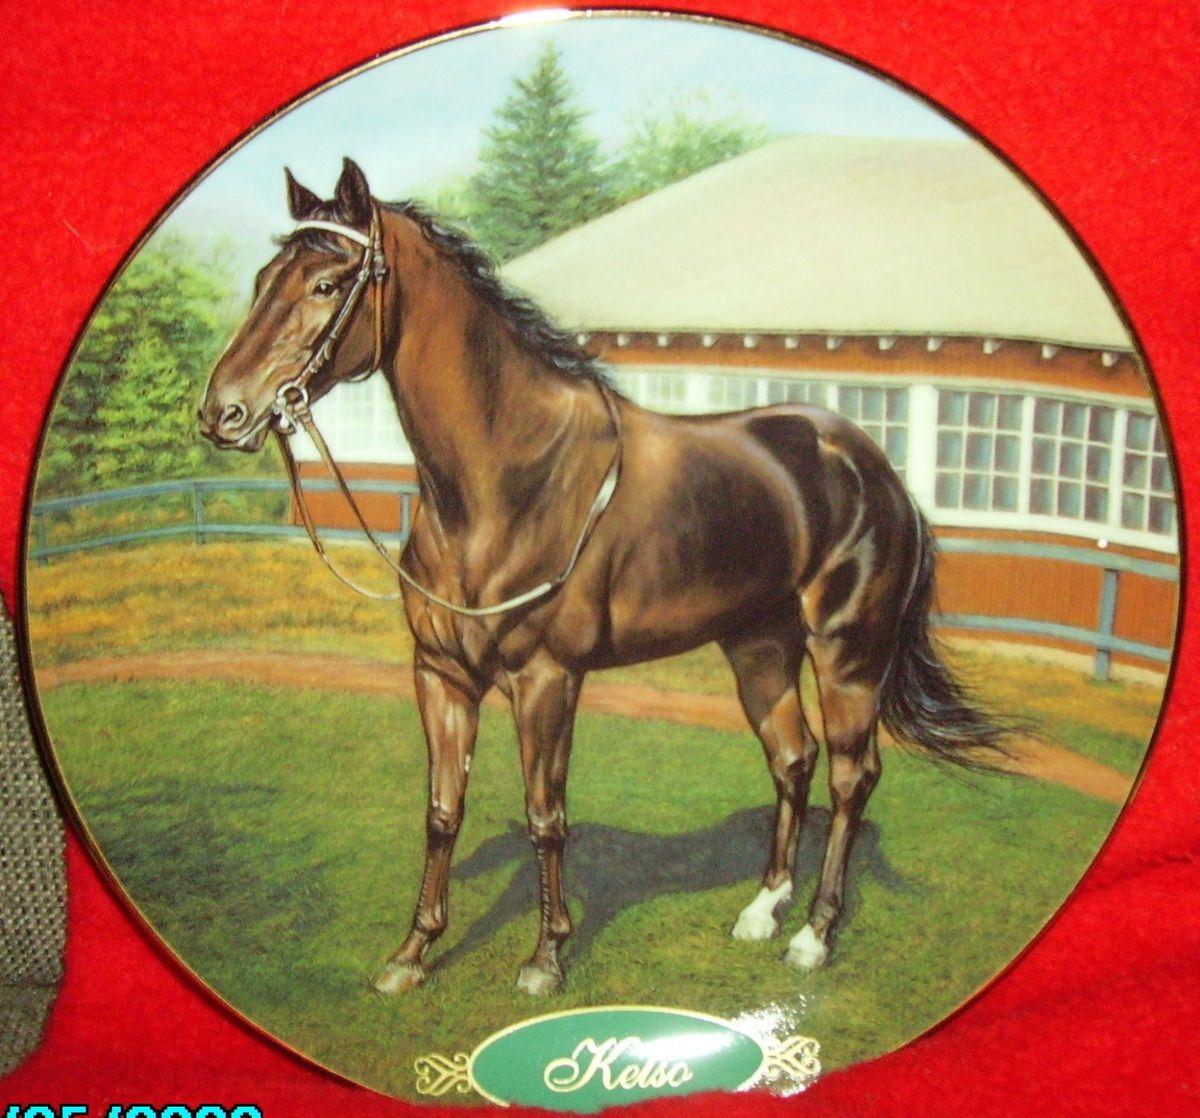 Danbury Mint Horse Plate Kelso Legendary Thoroughbreds RARE